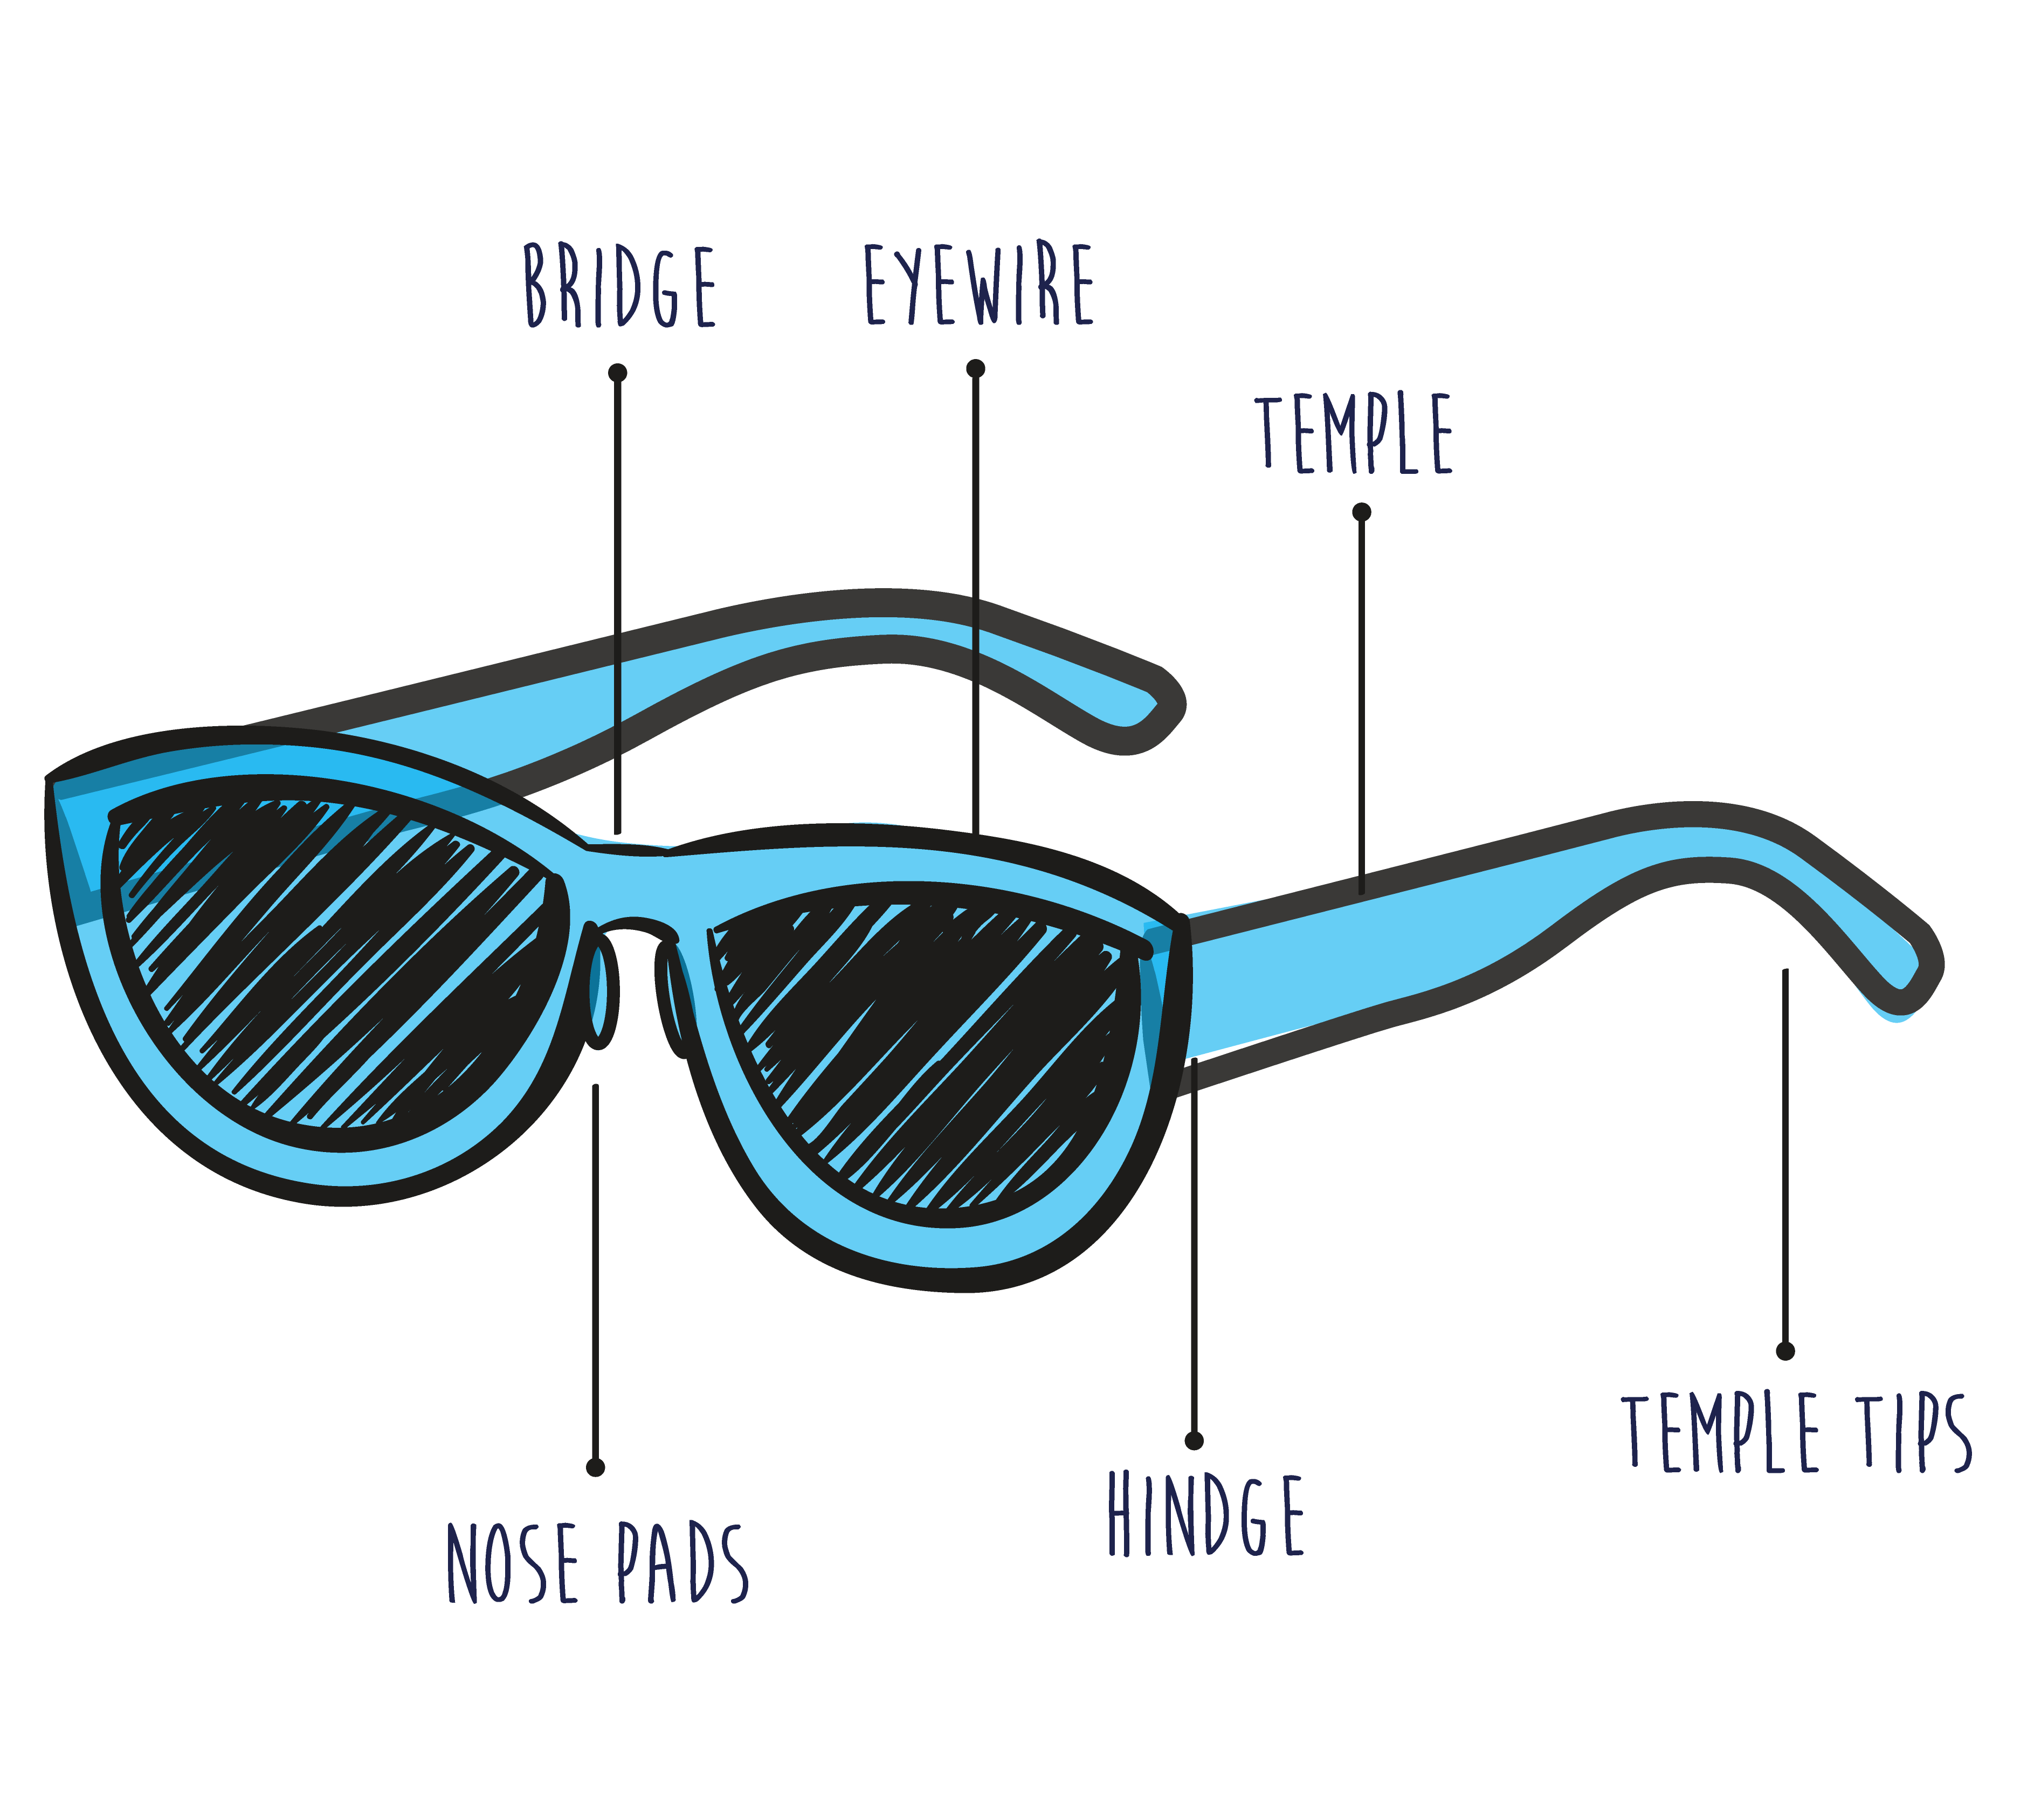 Basic Frame Anatomy